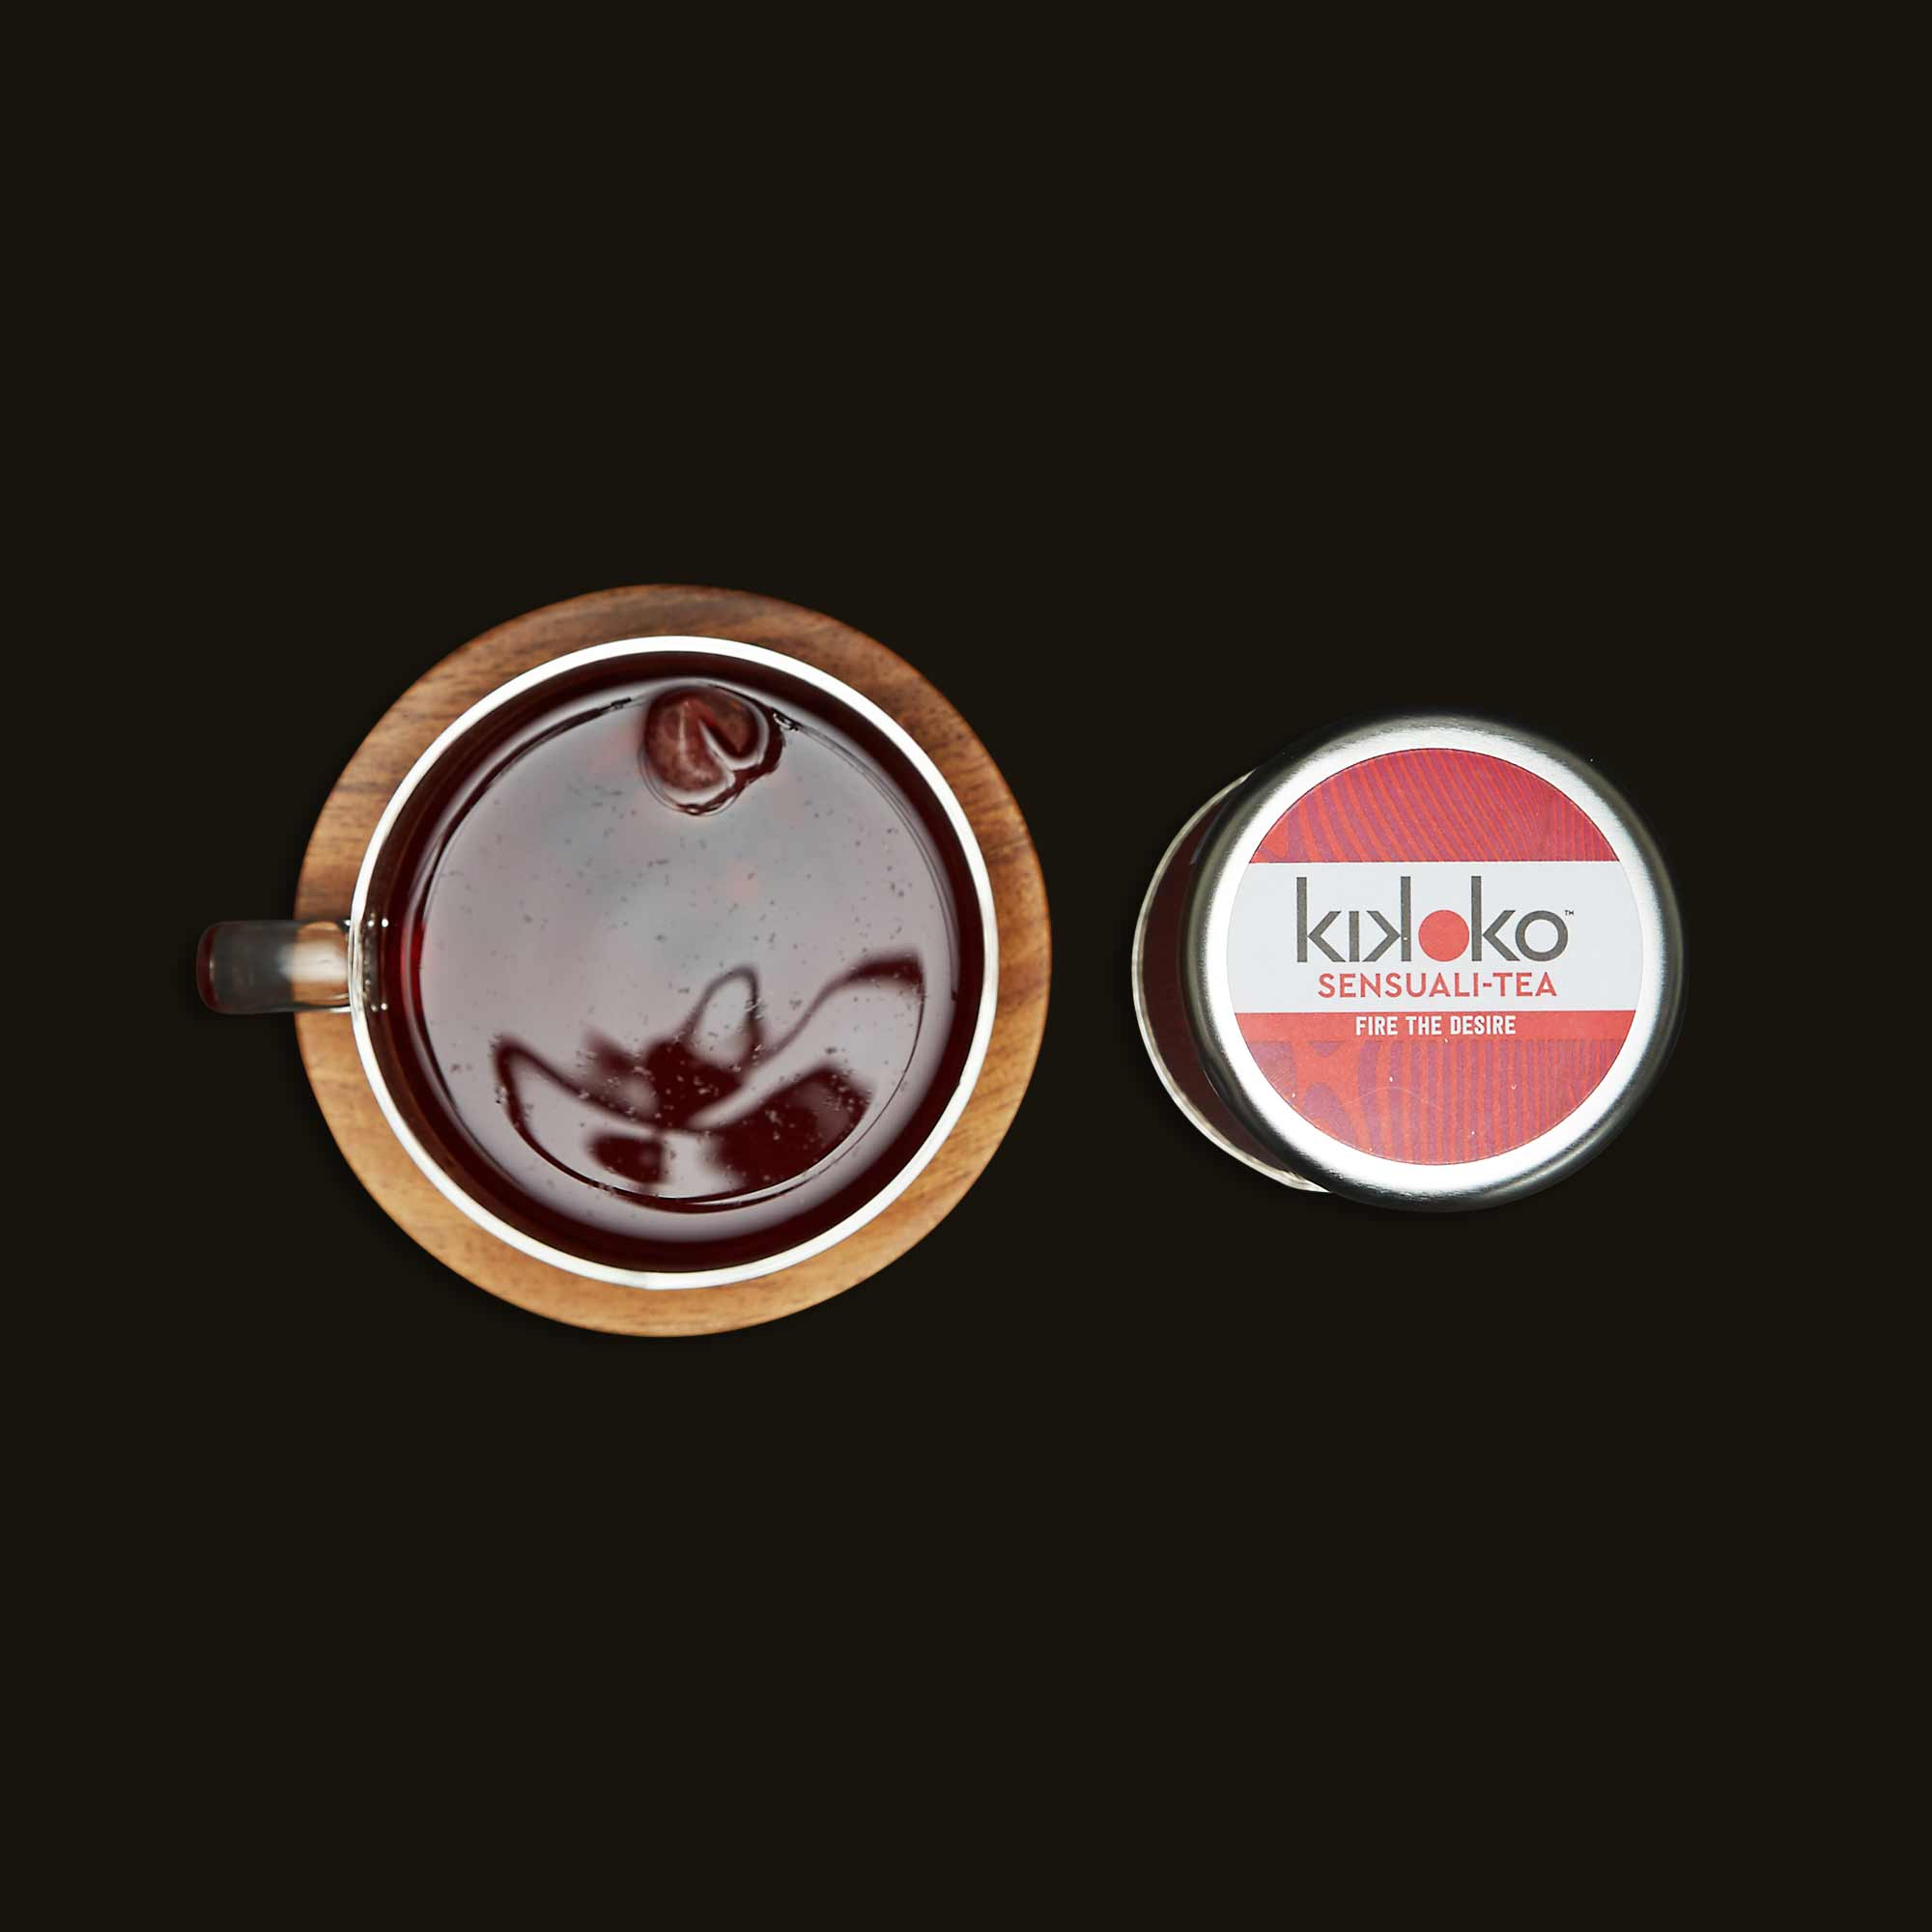 kikoko Sensuali-Tea